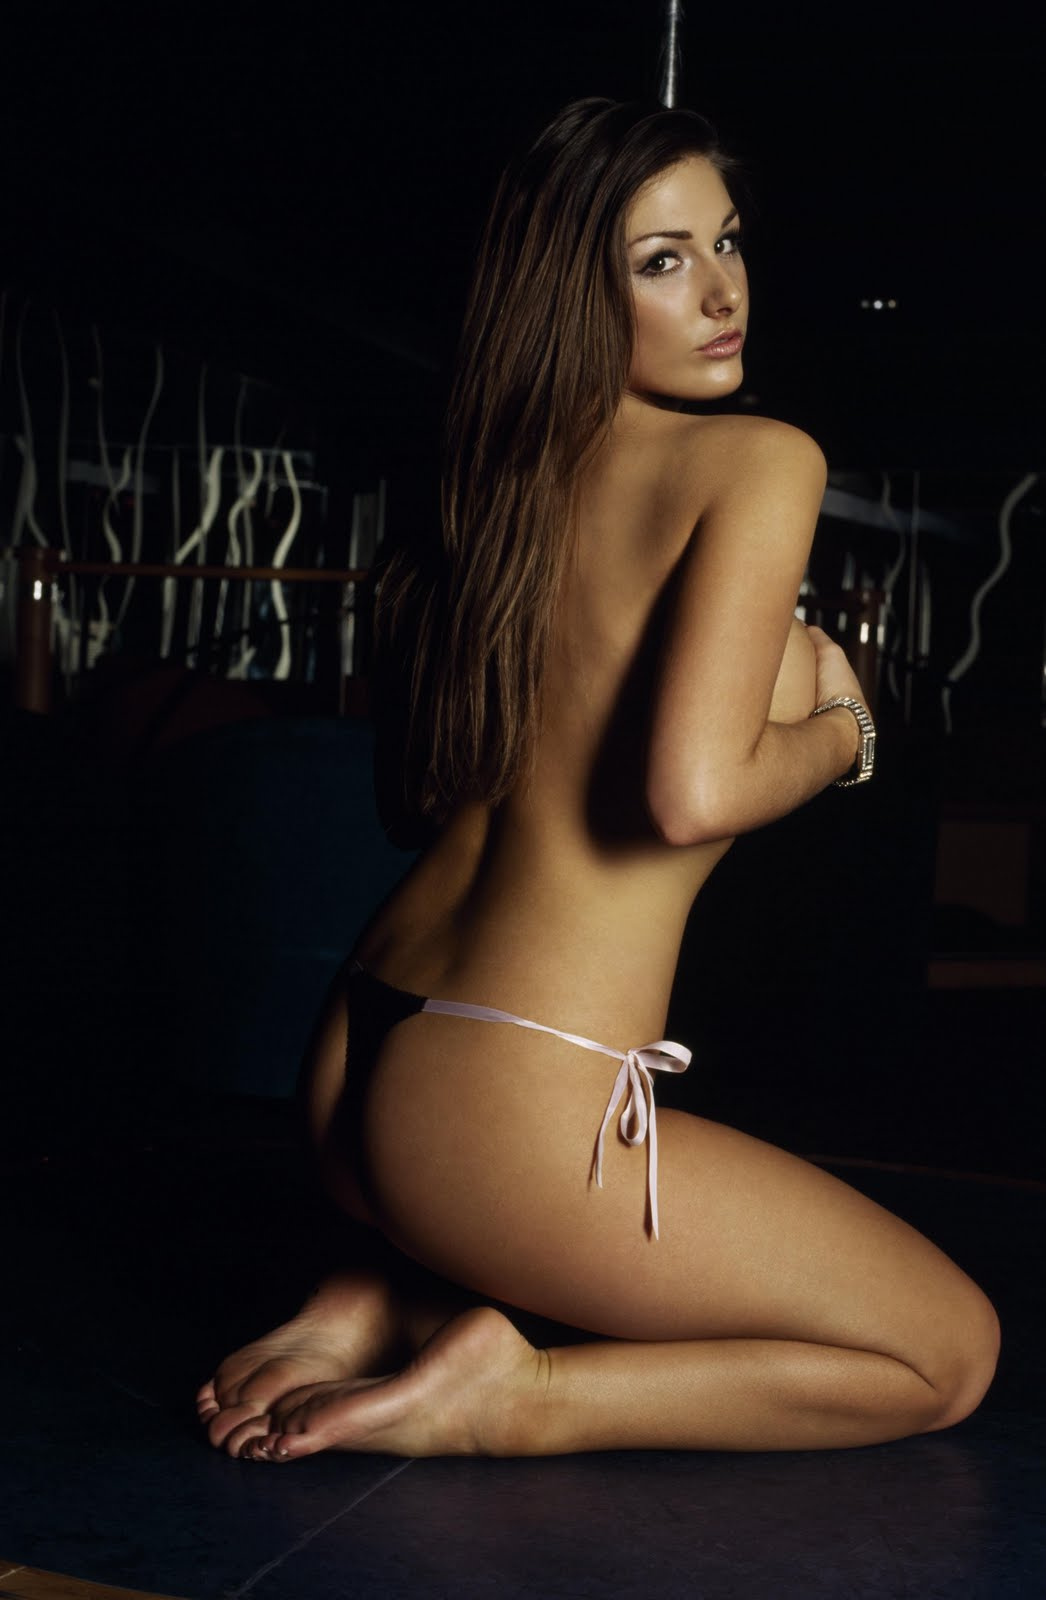 http://4.bp.blogspot.com/_UaLWp72nij4/S_wtd5t-vnI/AAAAAAAAMkk/c0wEXwnVbpY/s1600/lucy-pinder-feet-2.jpg